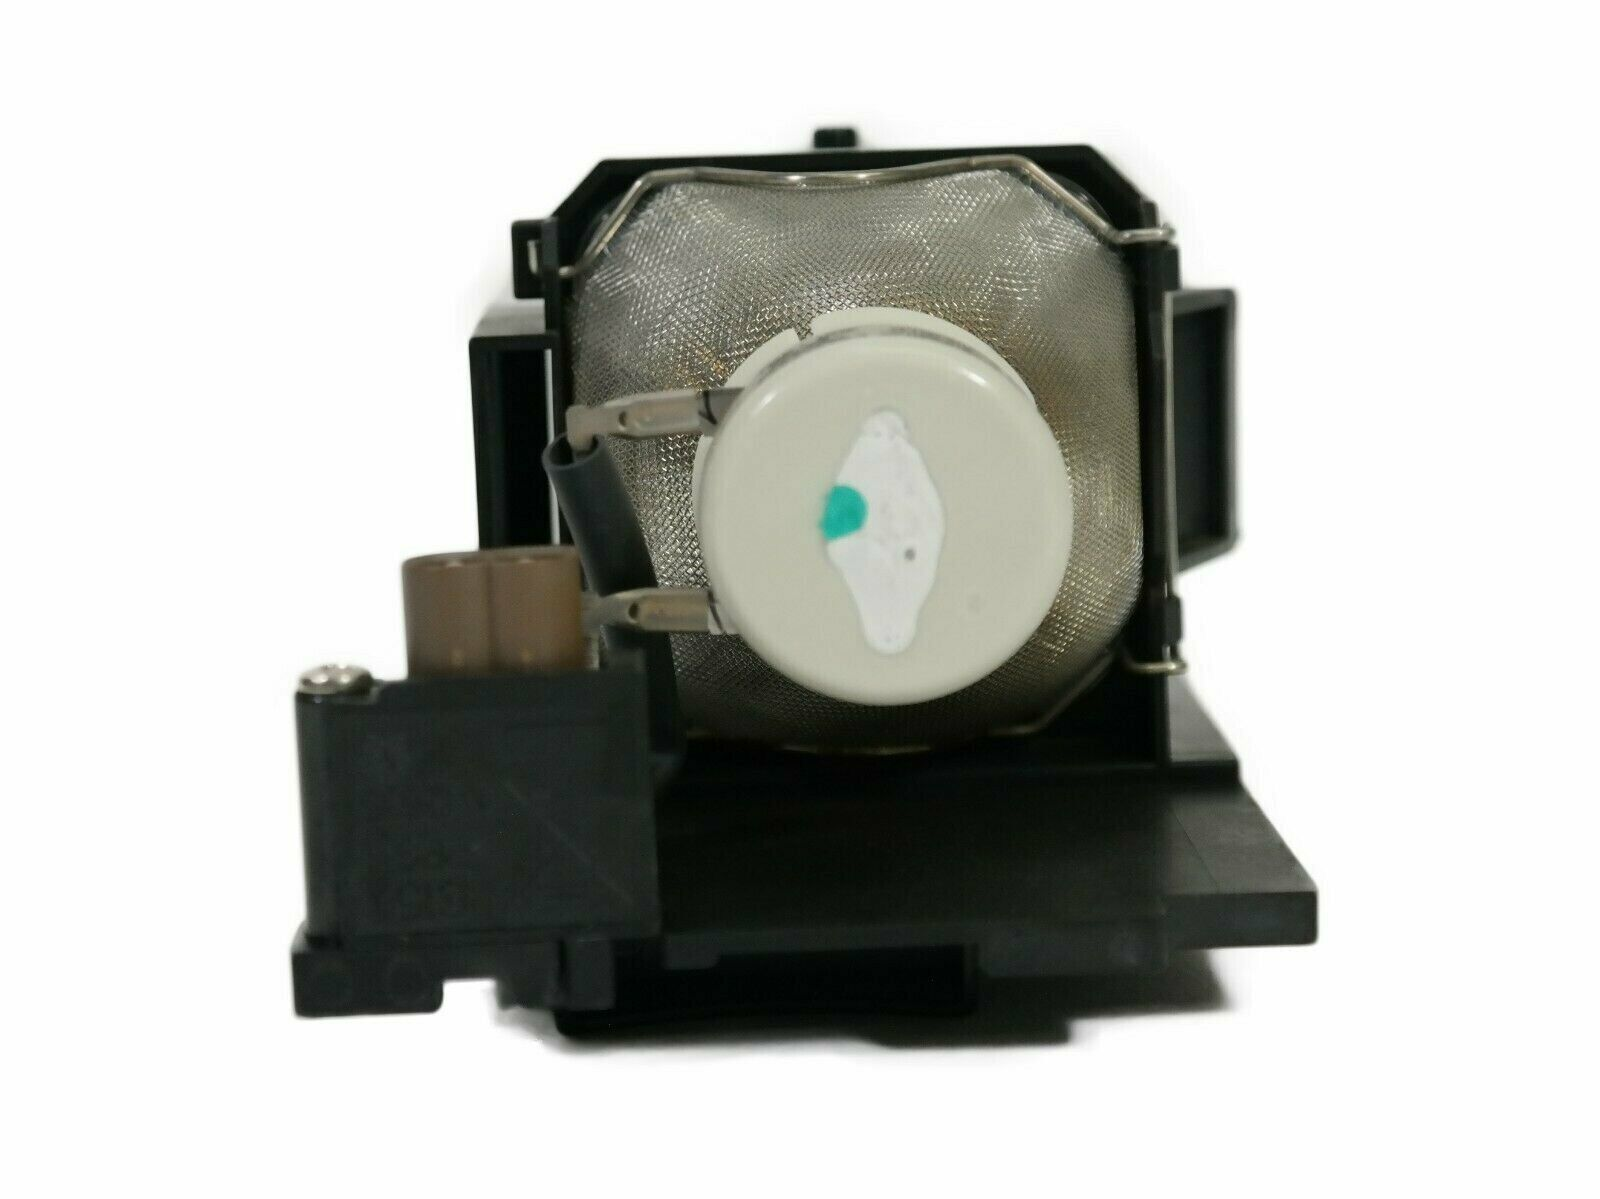 OEM HITACHI DT00691 833-291-3600 Projector Lamp-bulb for CP-X443W,X444W,X445W